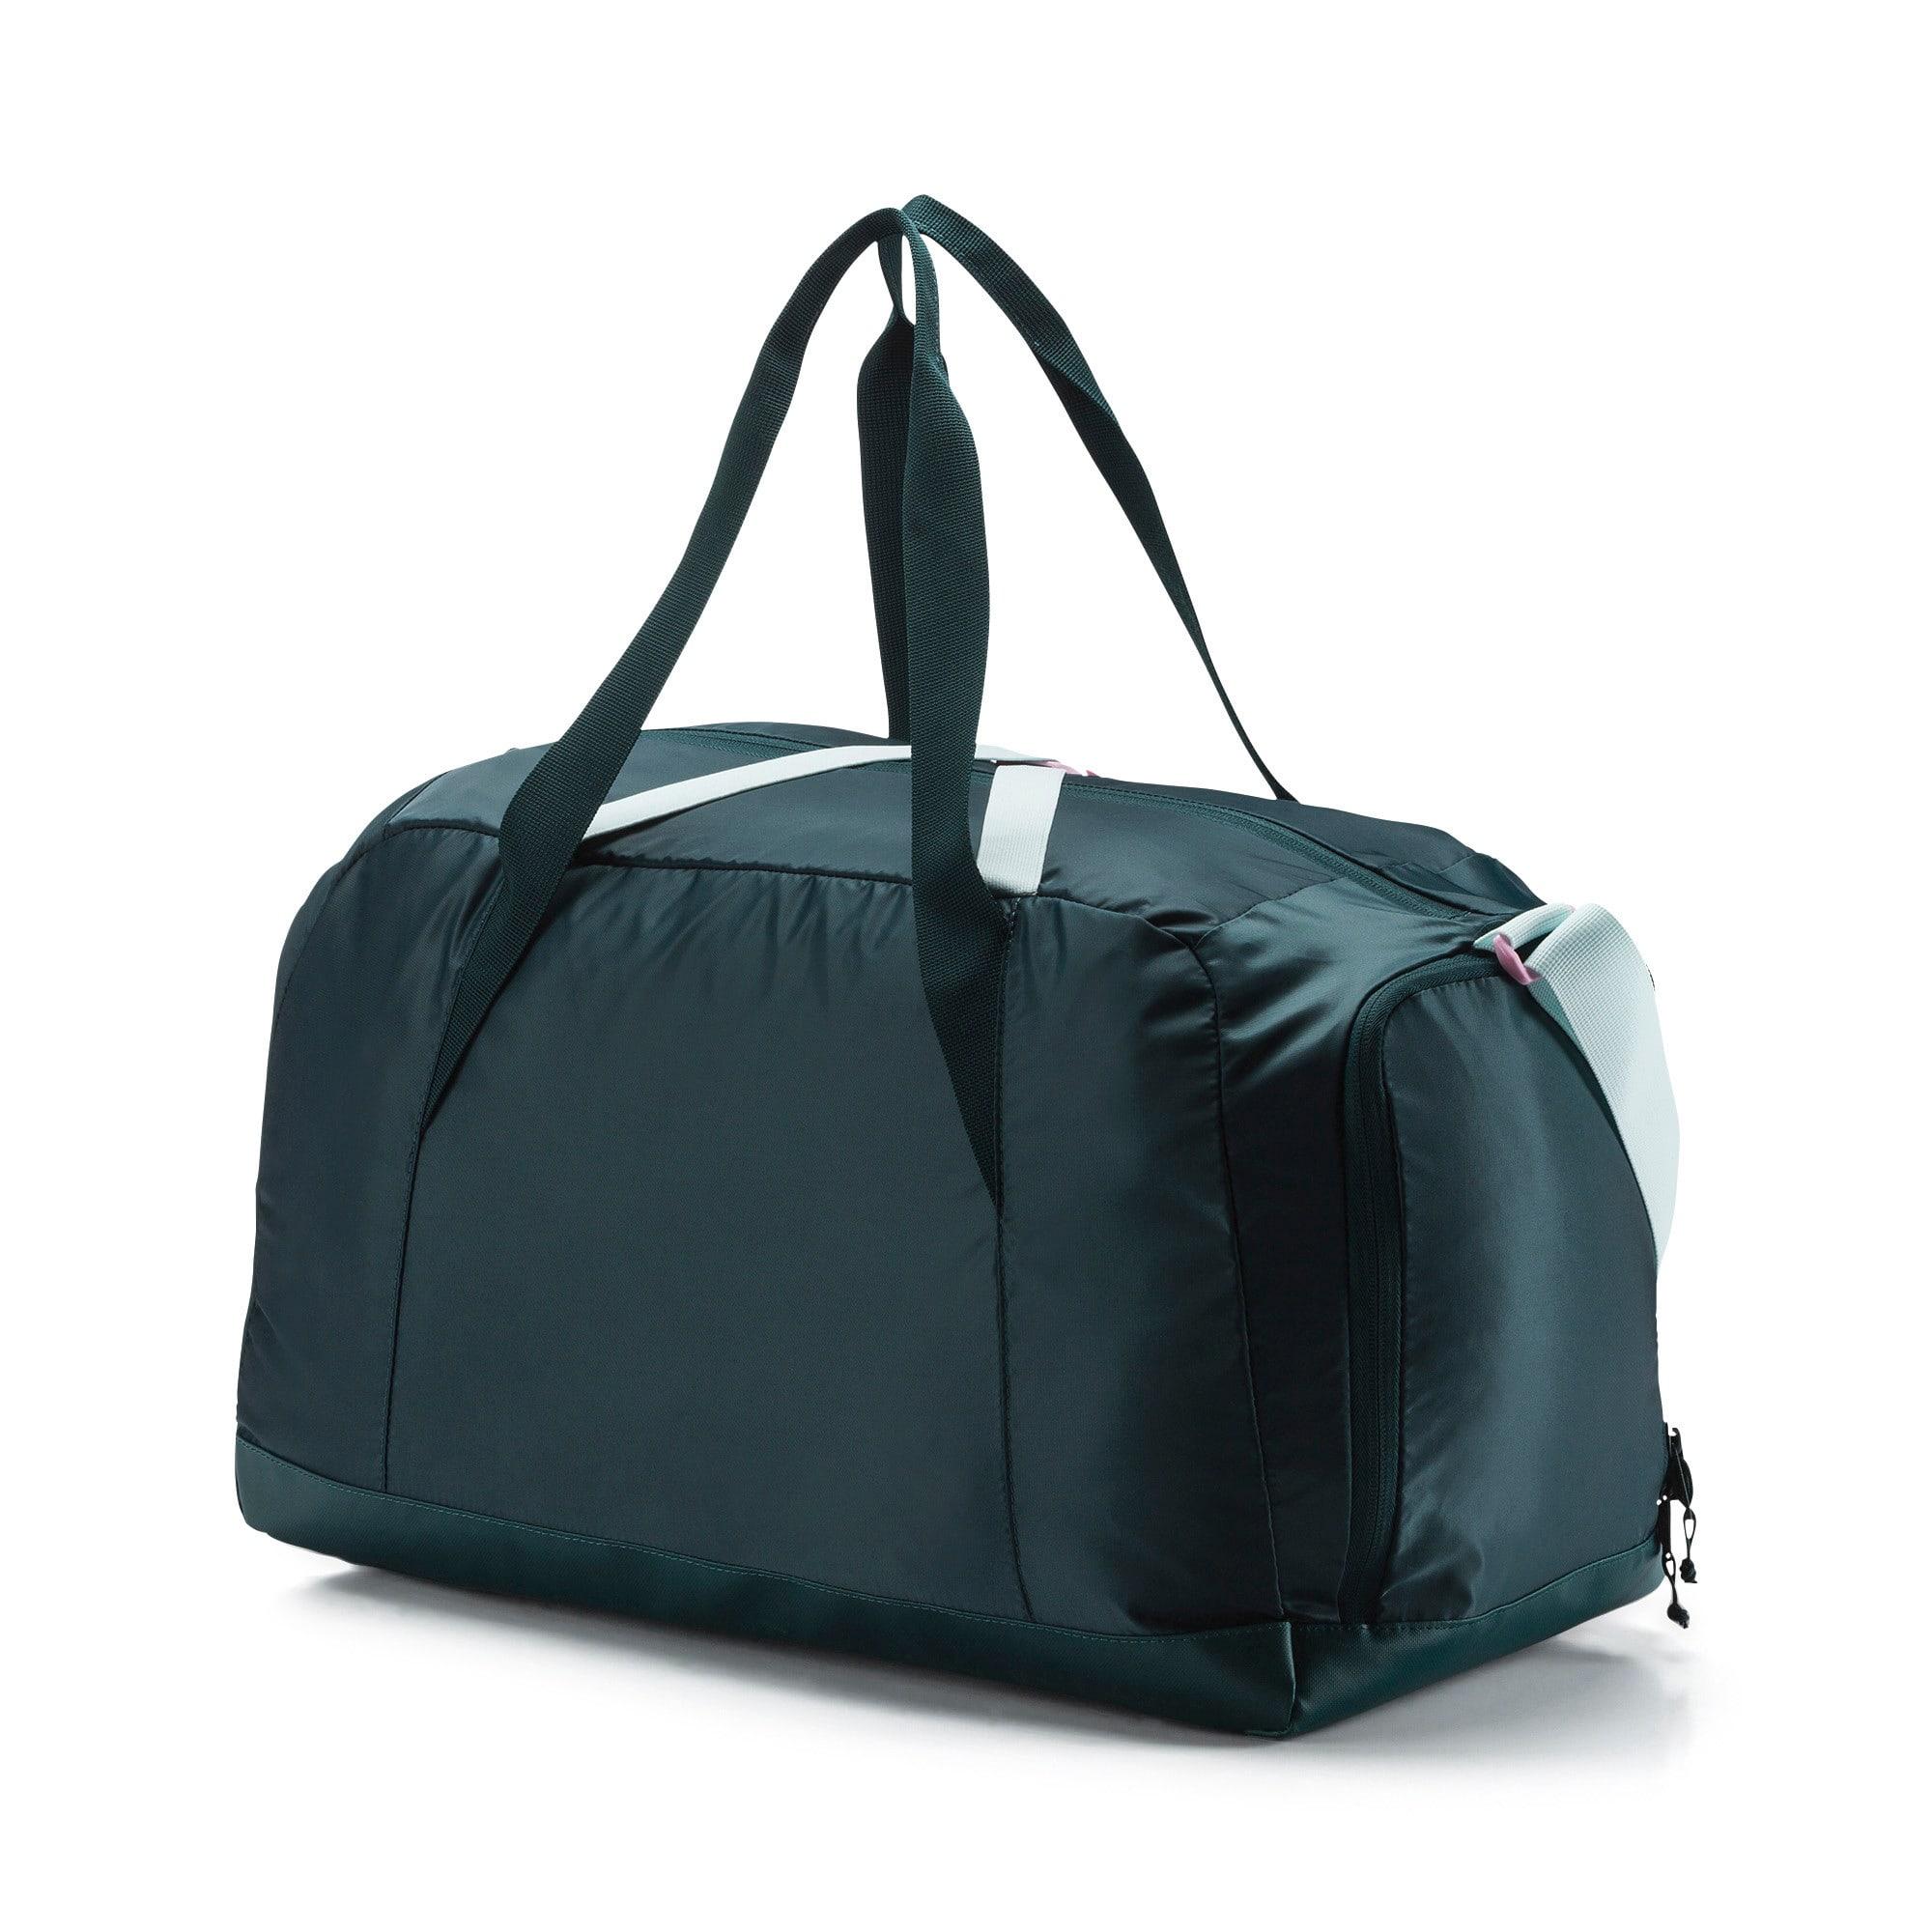 Thumbnail 3 of Active Training Duffel Bag, Ponderosa Pine, medium